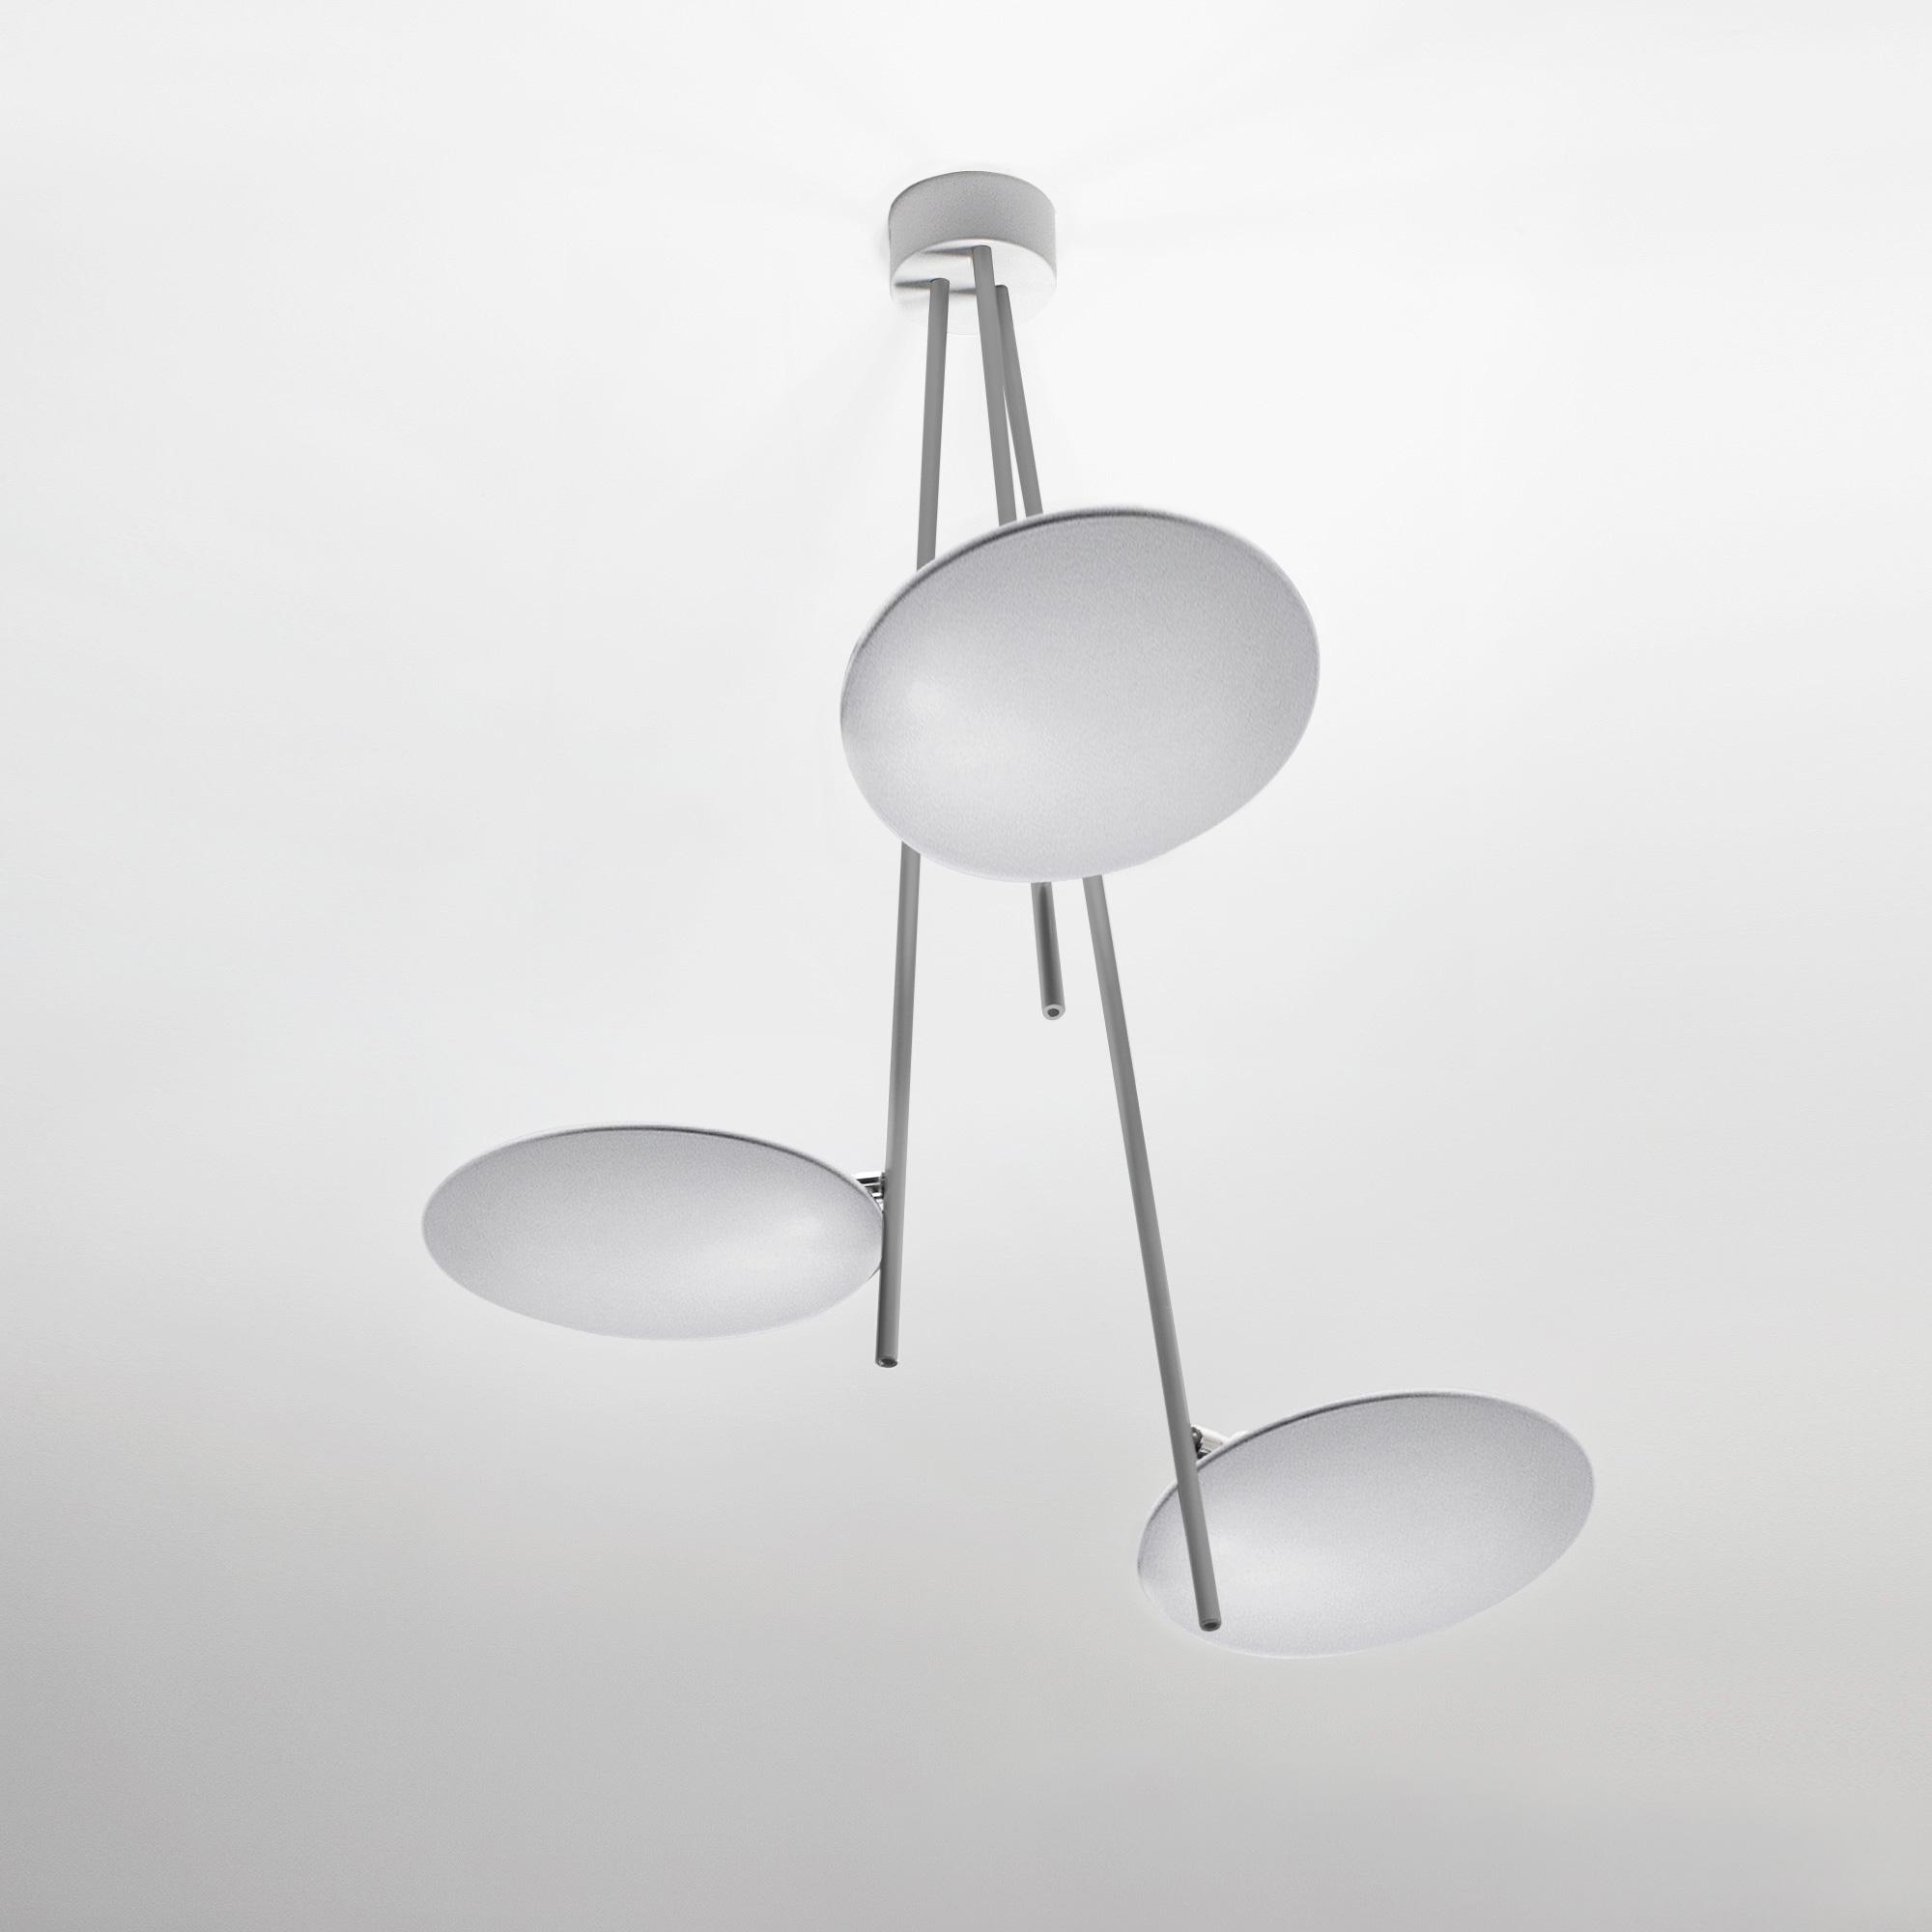 catellani smith lederam c3 led deckenleuchte lc3602 reuter onlineshop. Black Bedroom Furniture Sets. Home Design Ideas